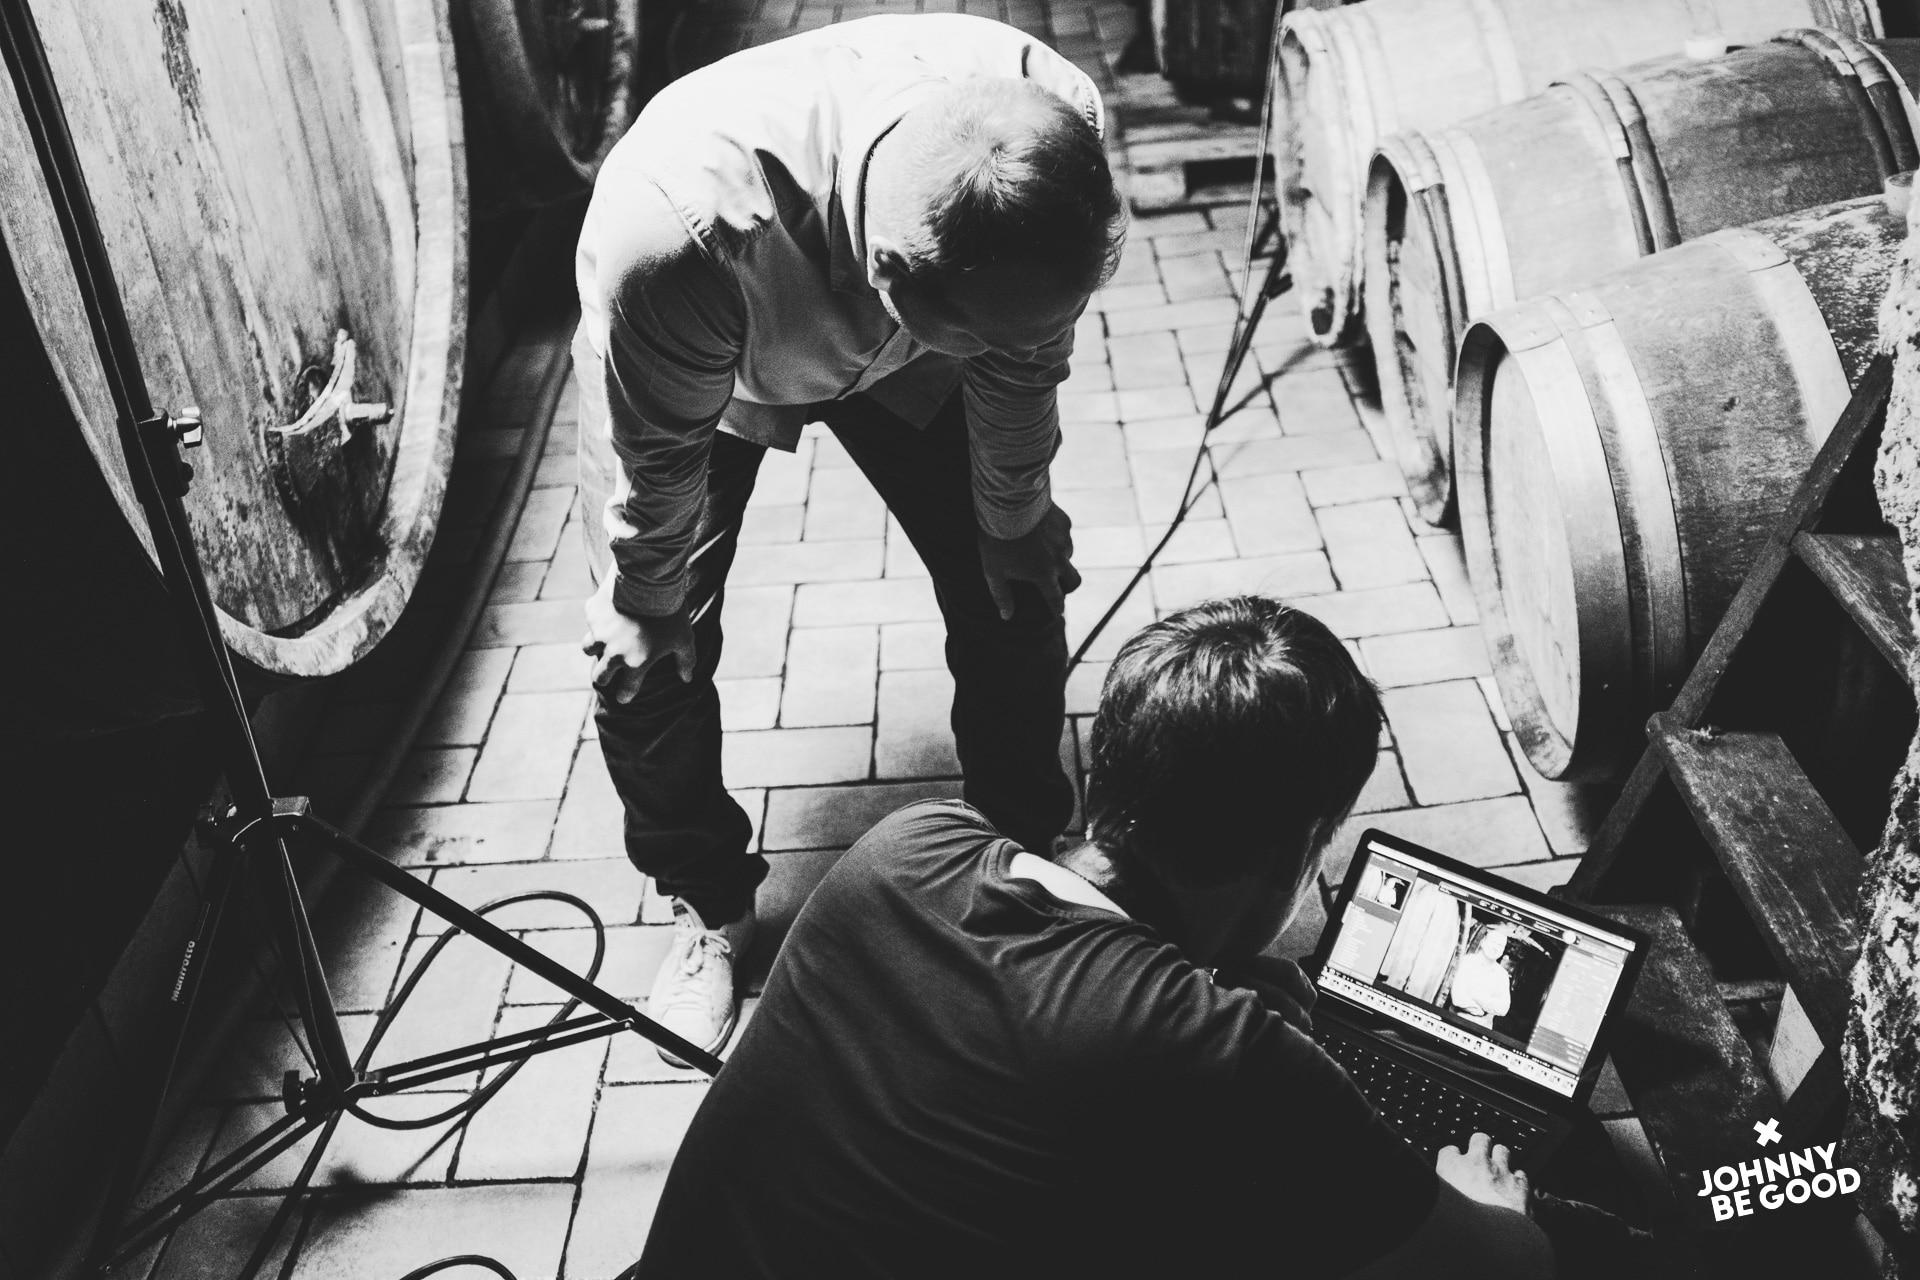 JohnnyBeGood–Wenzl Kast Behindthescenes